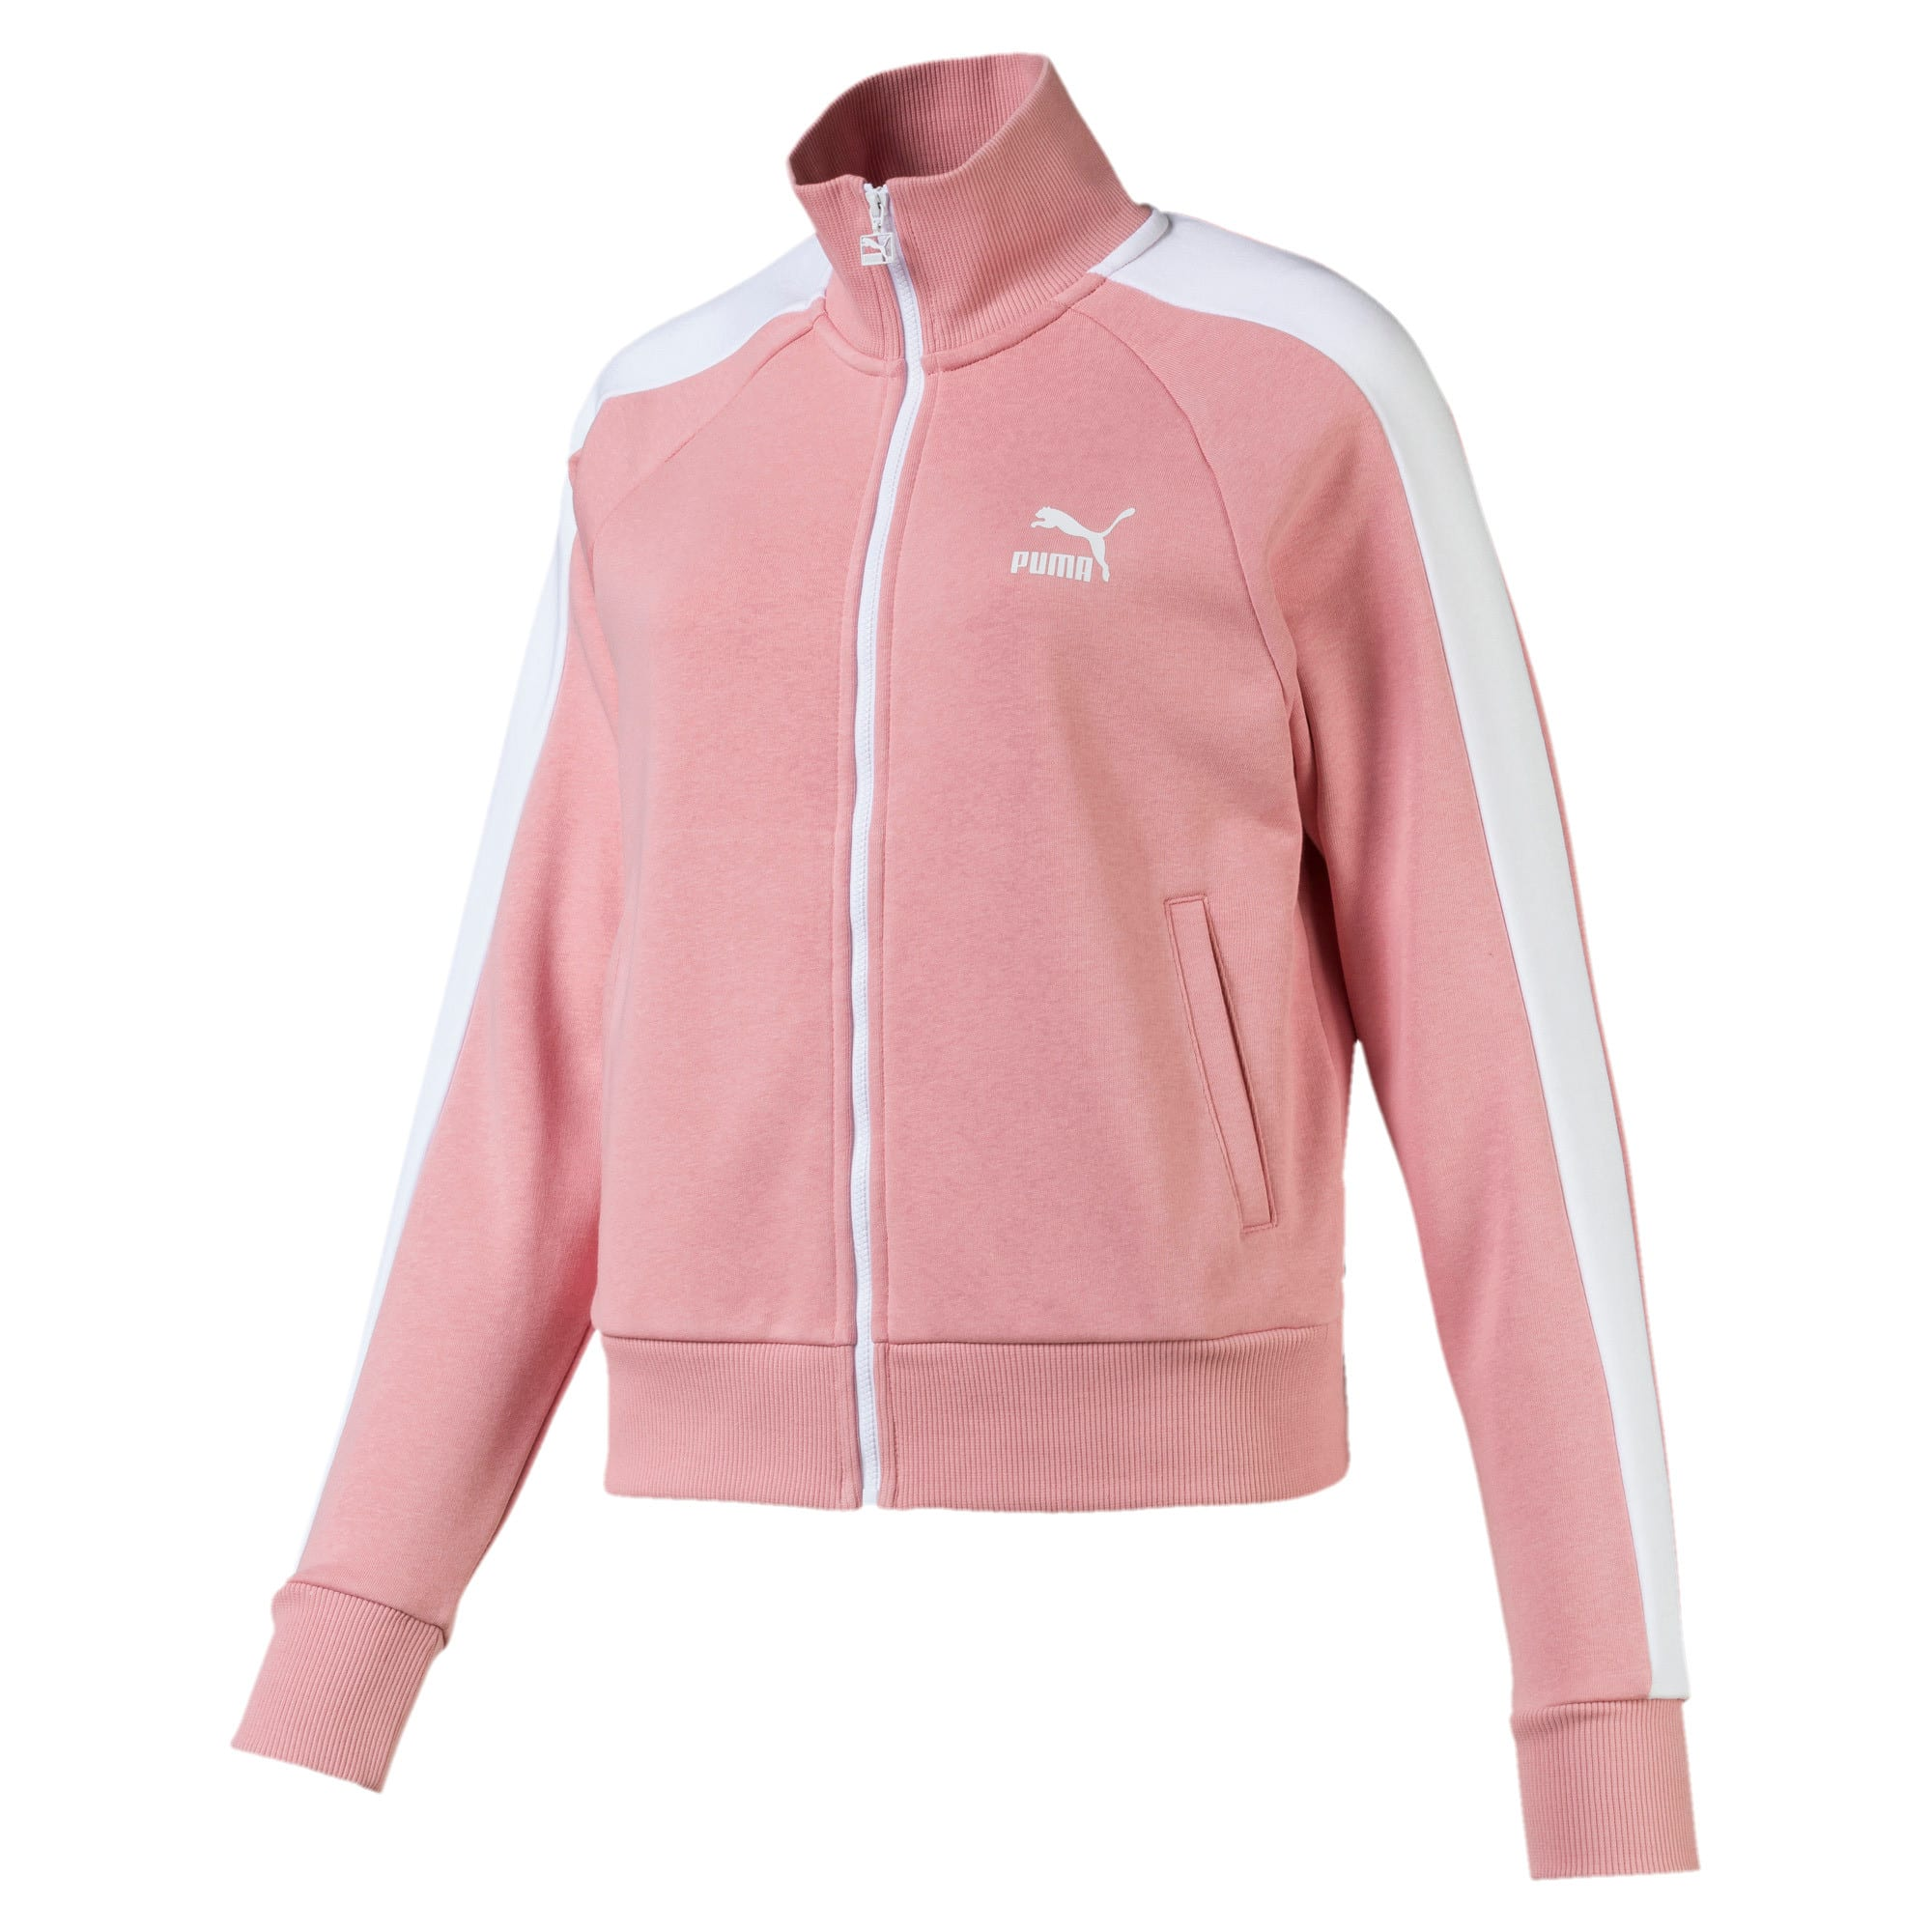 Thumbnail 1 of Classics T7 Women's Track Jacket, Bridal Rose, medium